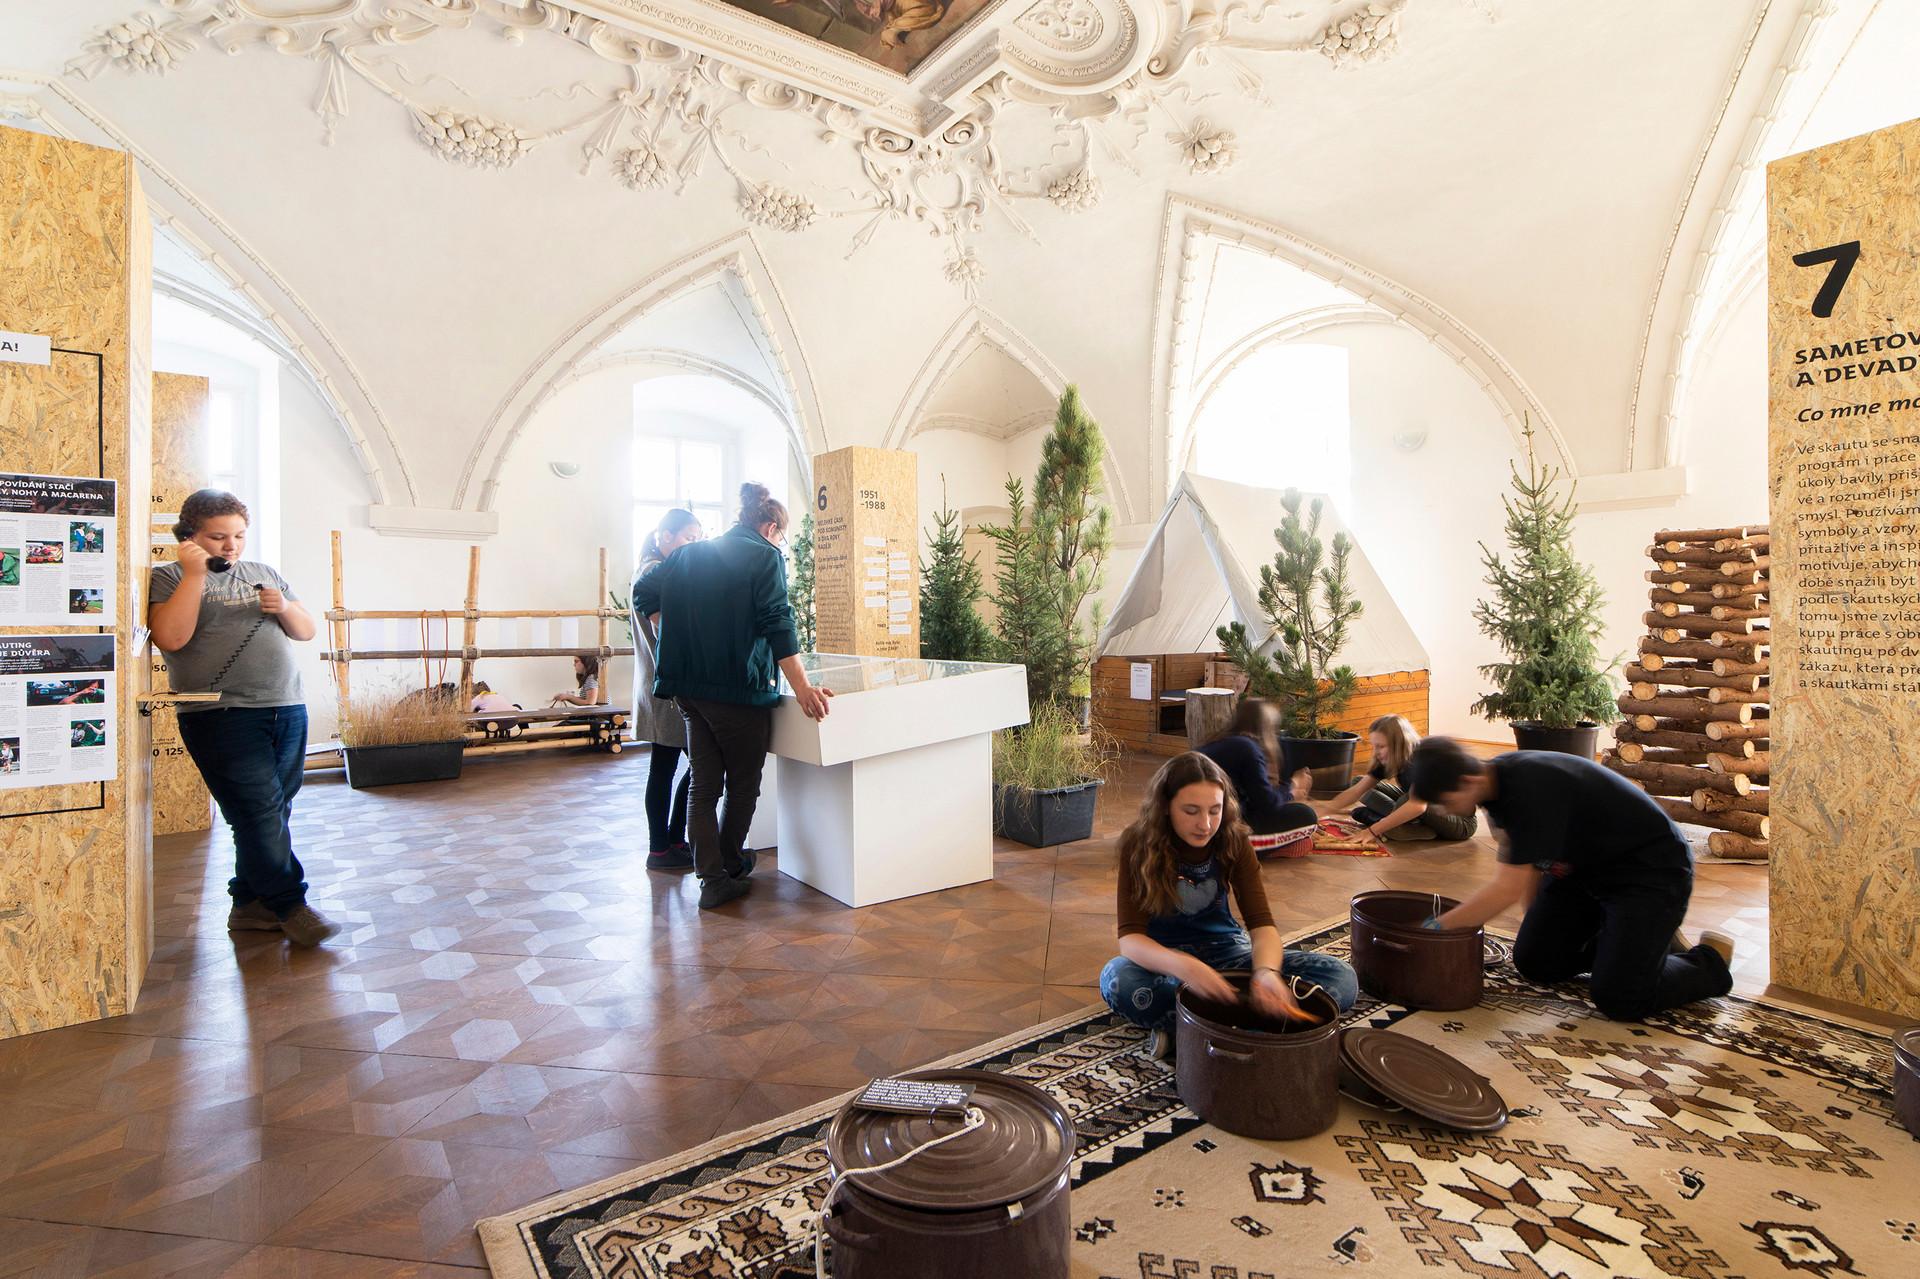 Instalation at the Holešov castle